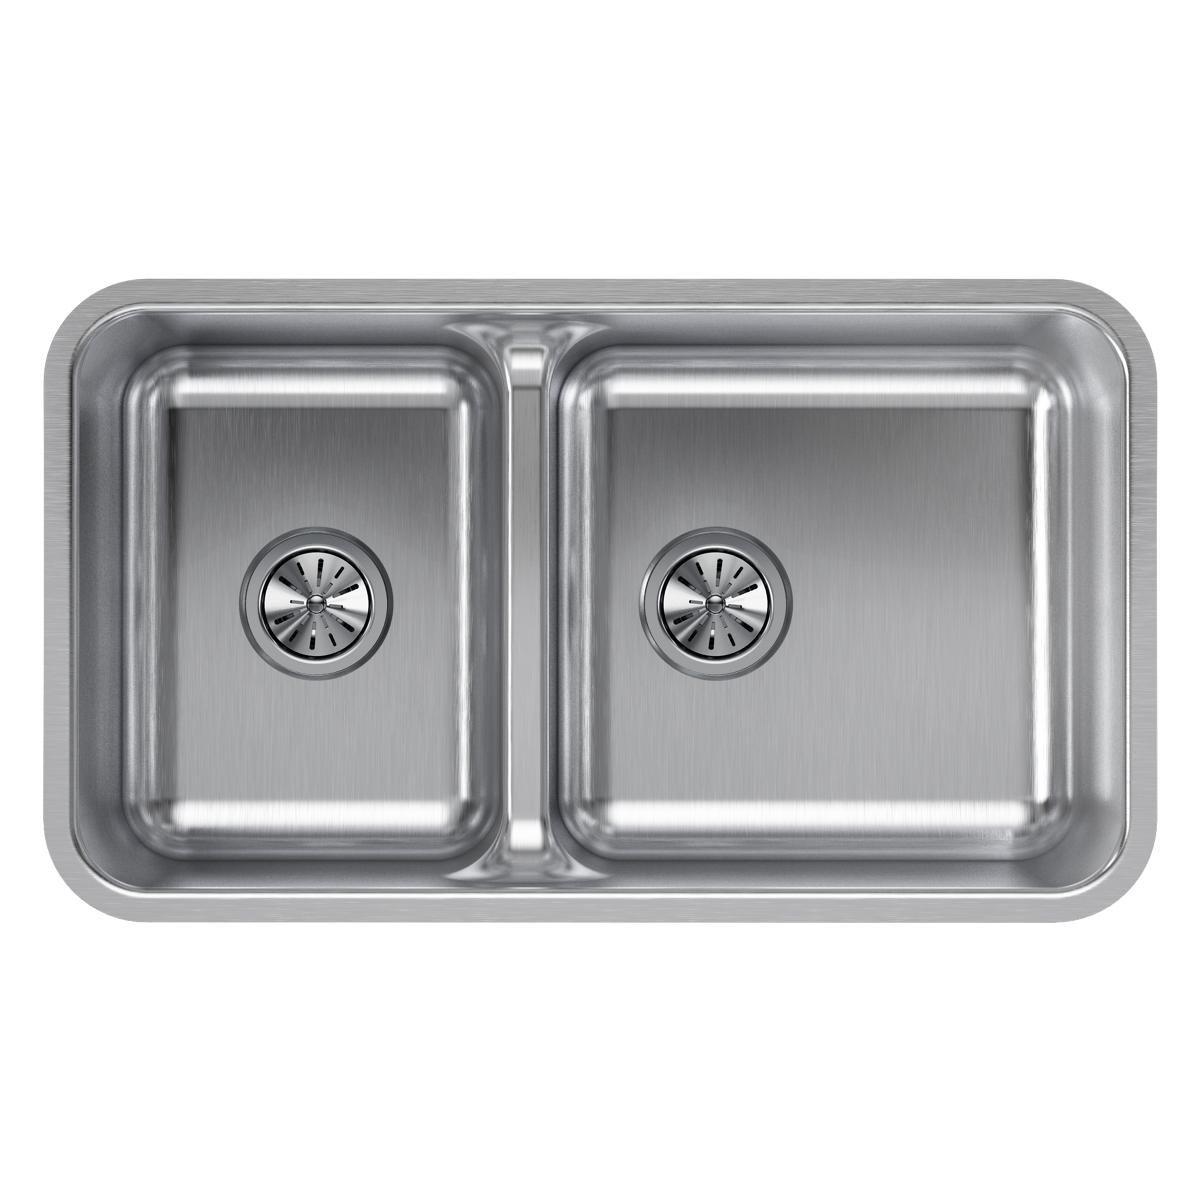 Elkay ELUHAQD32179 Lustertone Classic 40/60 Double Bowl Undermount Stainless Steel Sink with Aqua Divide by Elkay